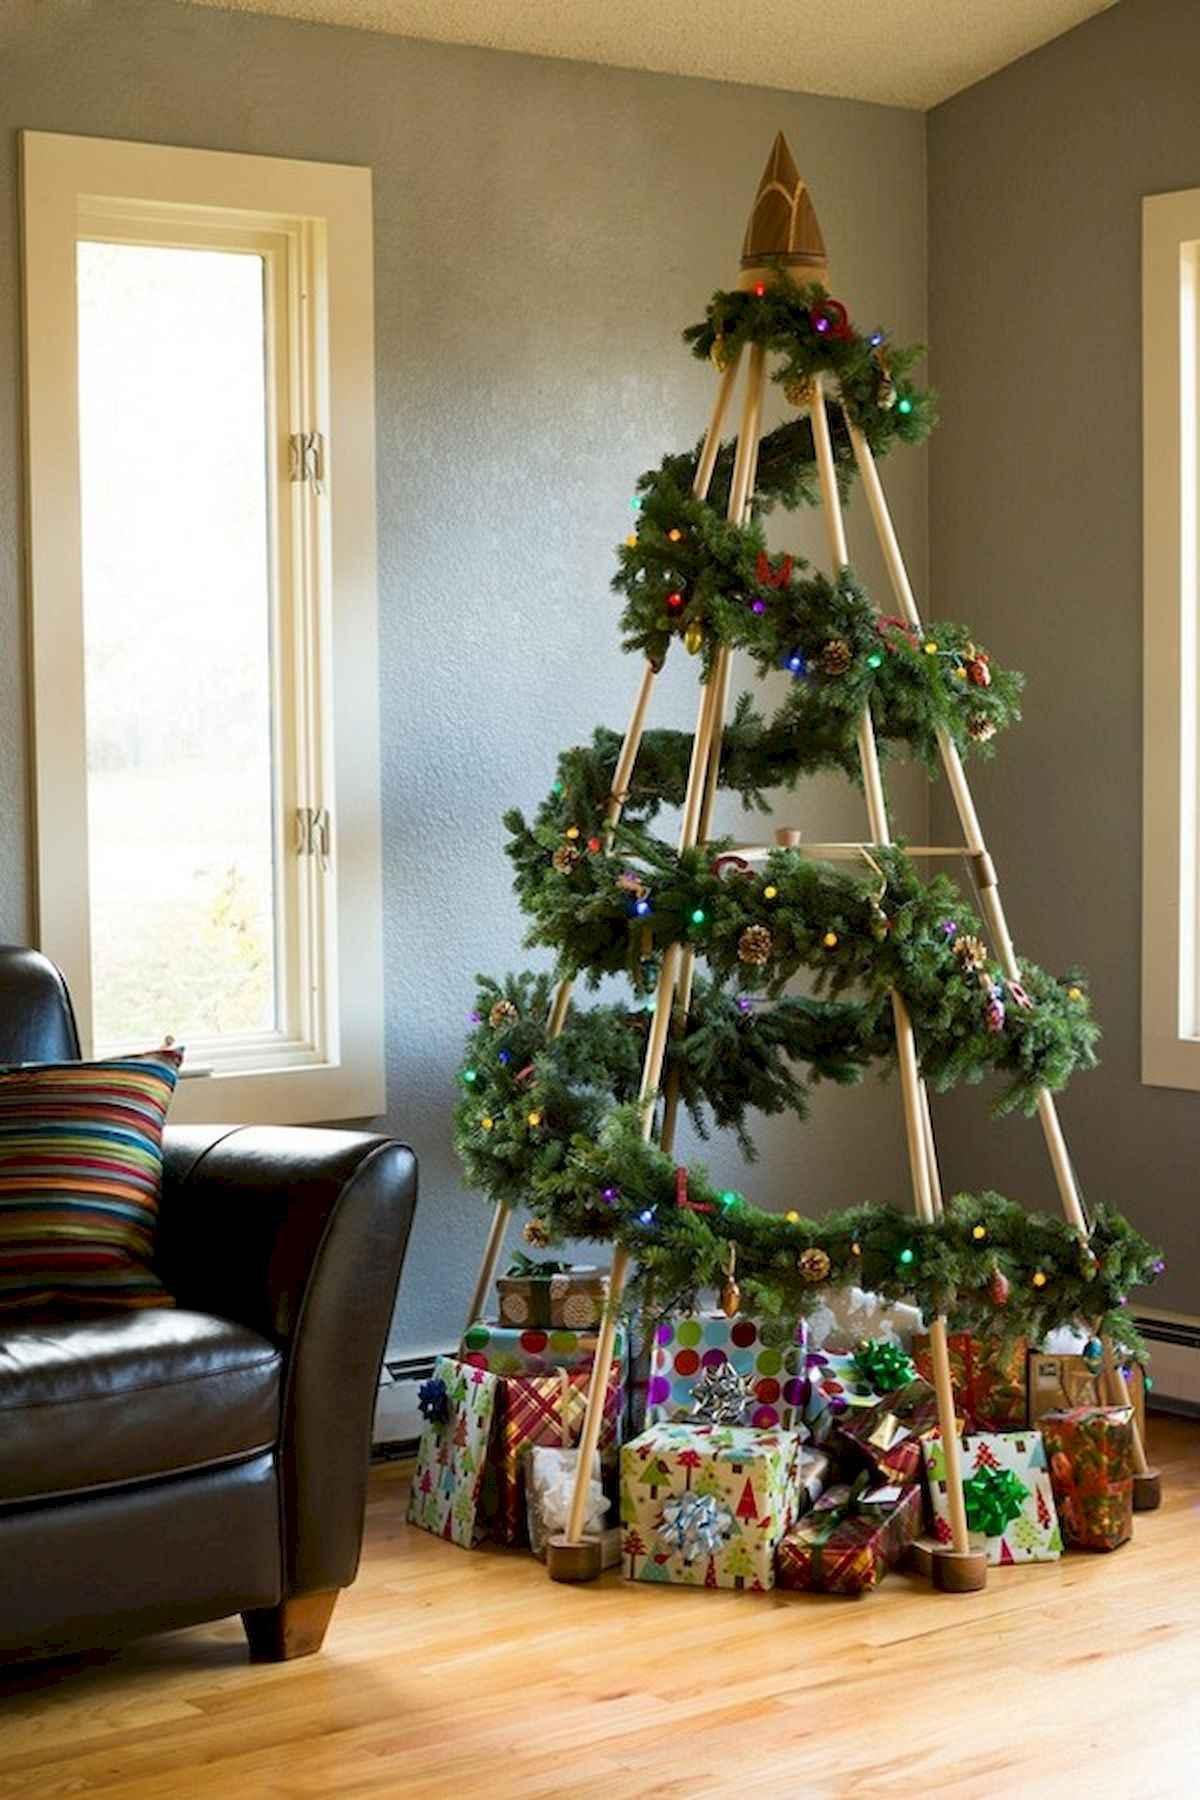 50 diy christmas decorations ideas (38)